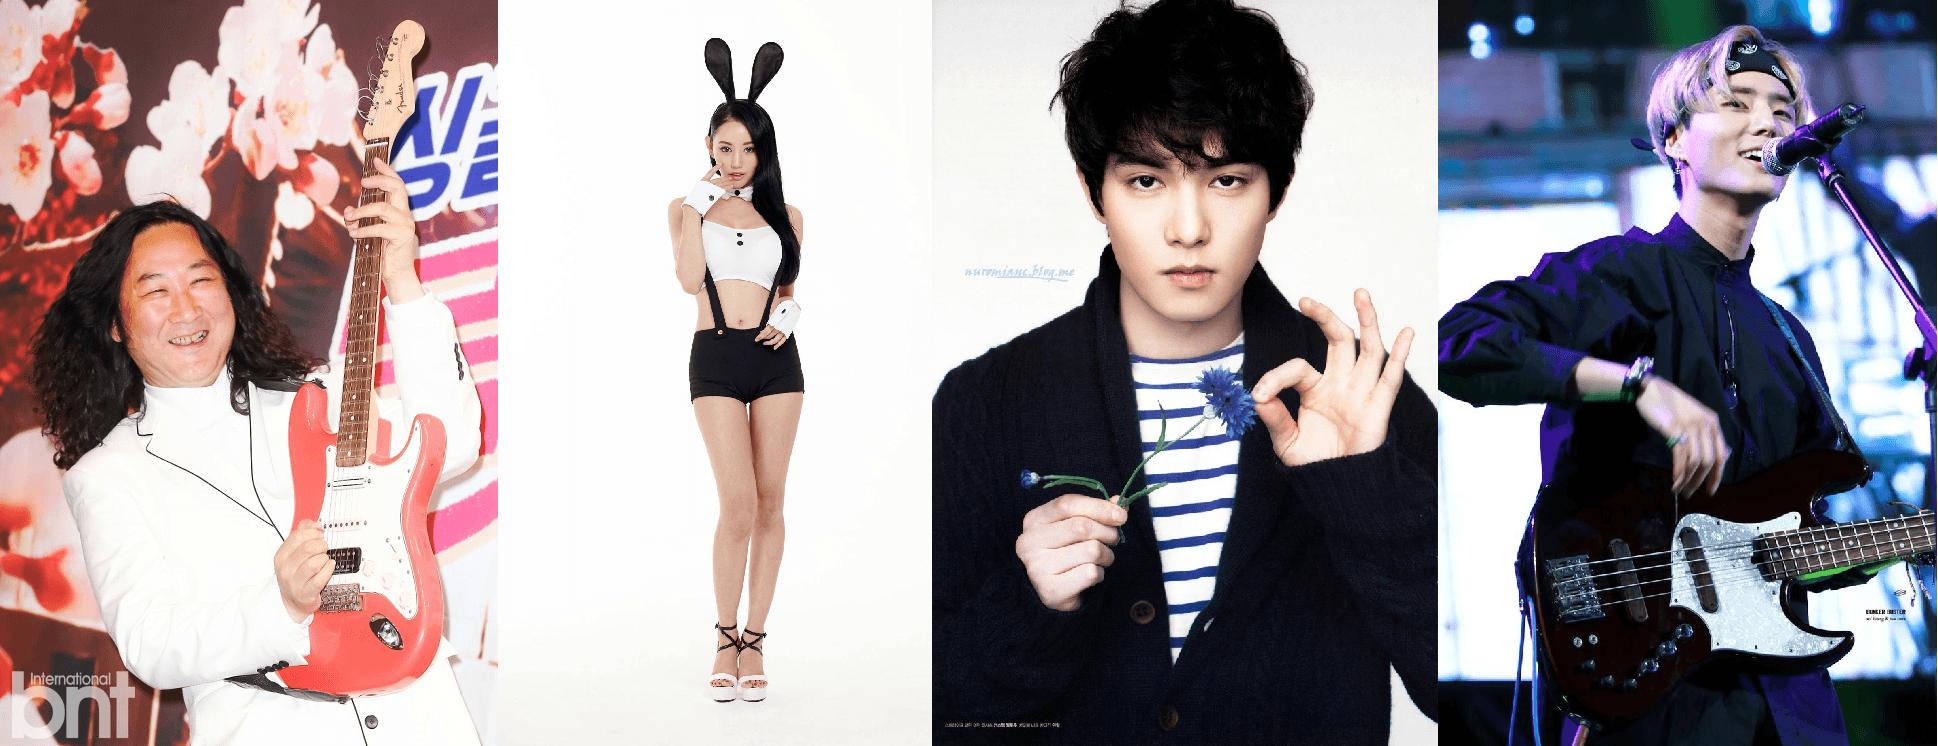 kim-do-kyun-bebop-ahyeon-cnblue-jonghyun-day6-young-k